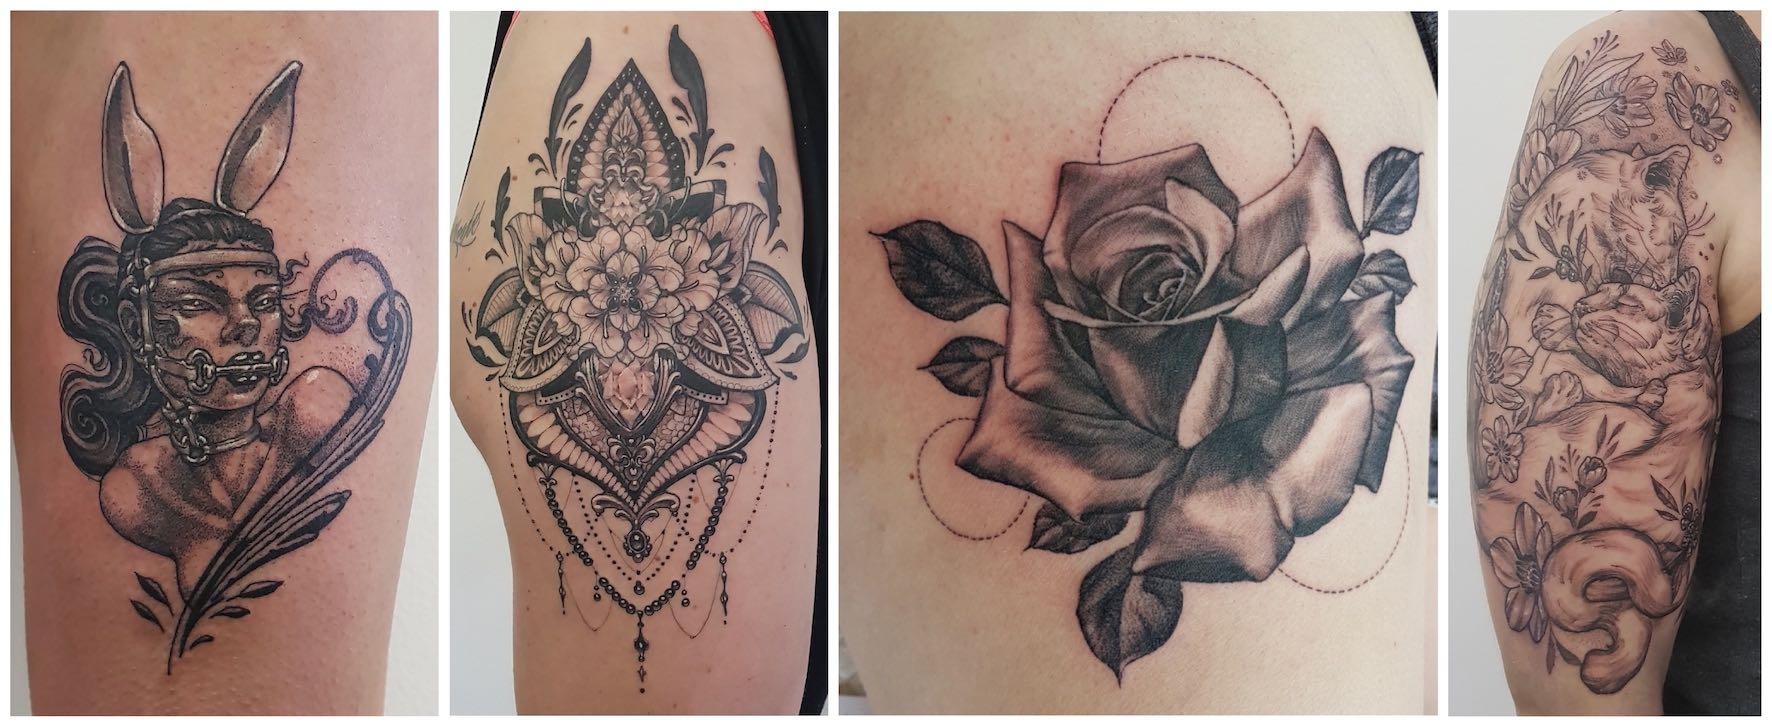 Illustrative tattoos done by Séona Stewart